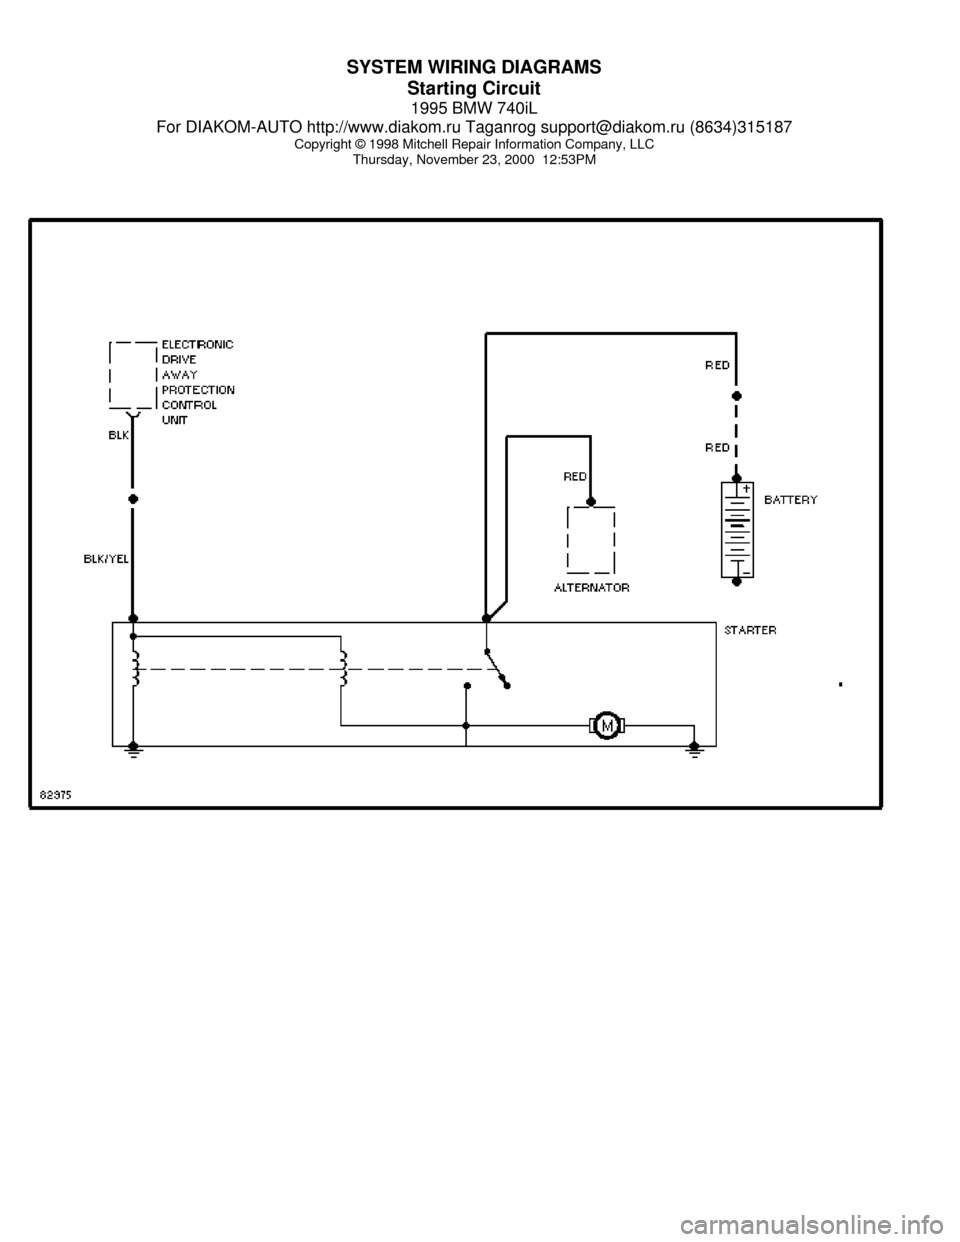 medium resolution of bmw 740il 1995 e38 system wiring diagramse38 wiring diagrams 20